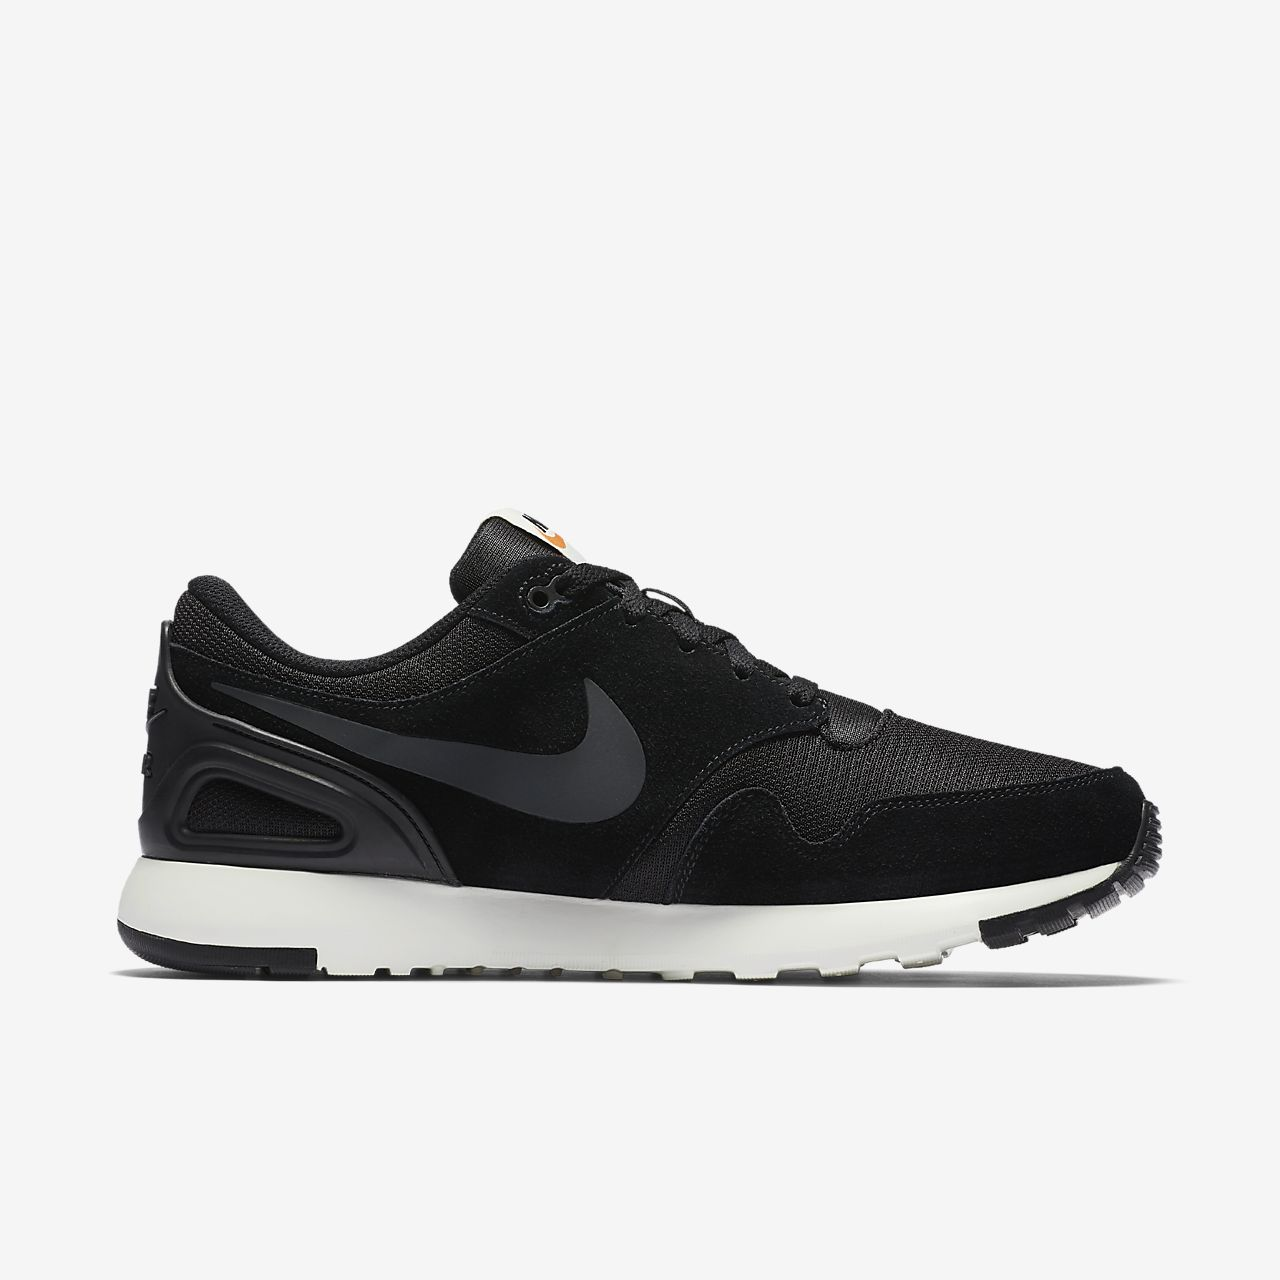 341759933dc Nike Air Vibenna Men's Shoe